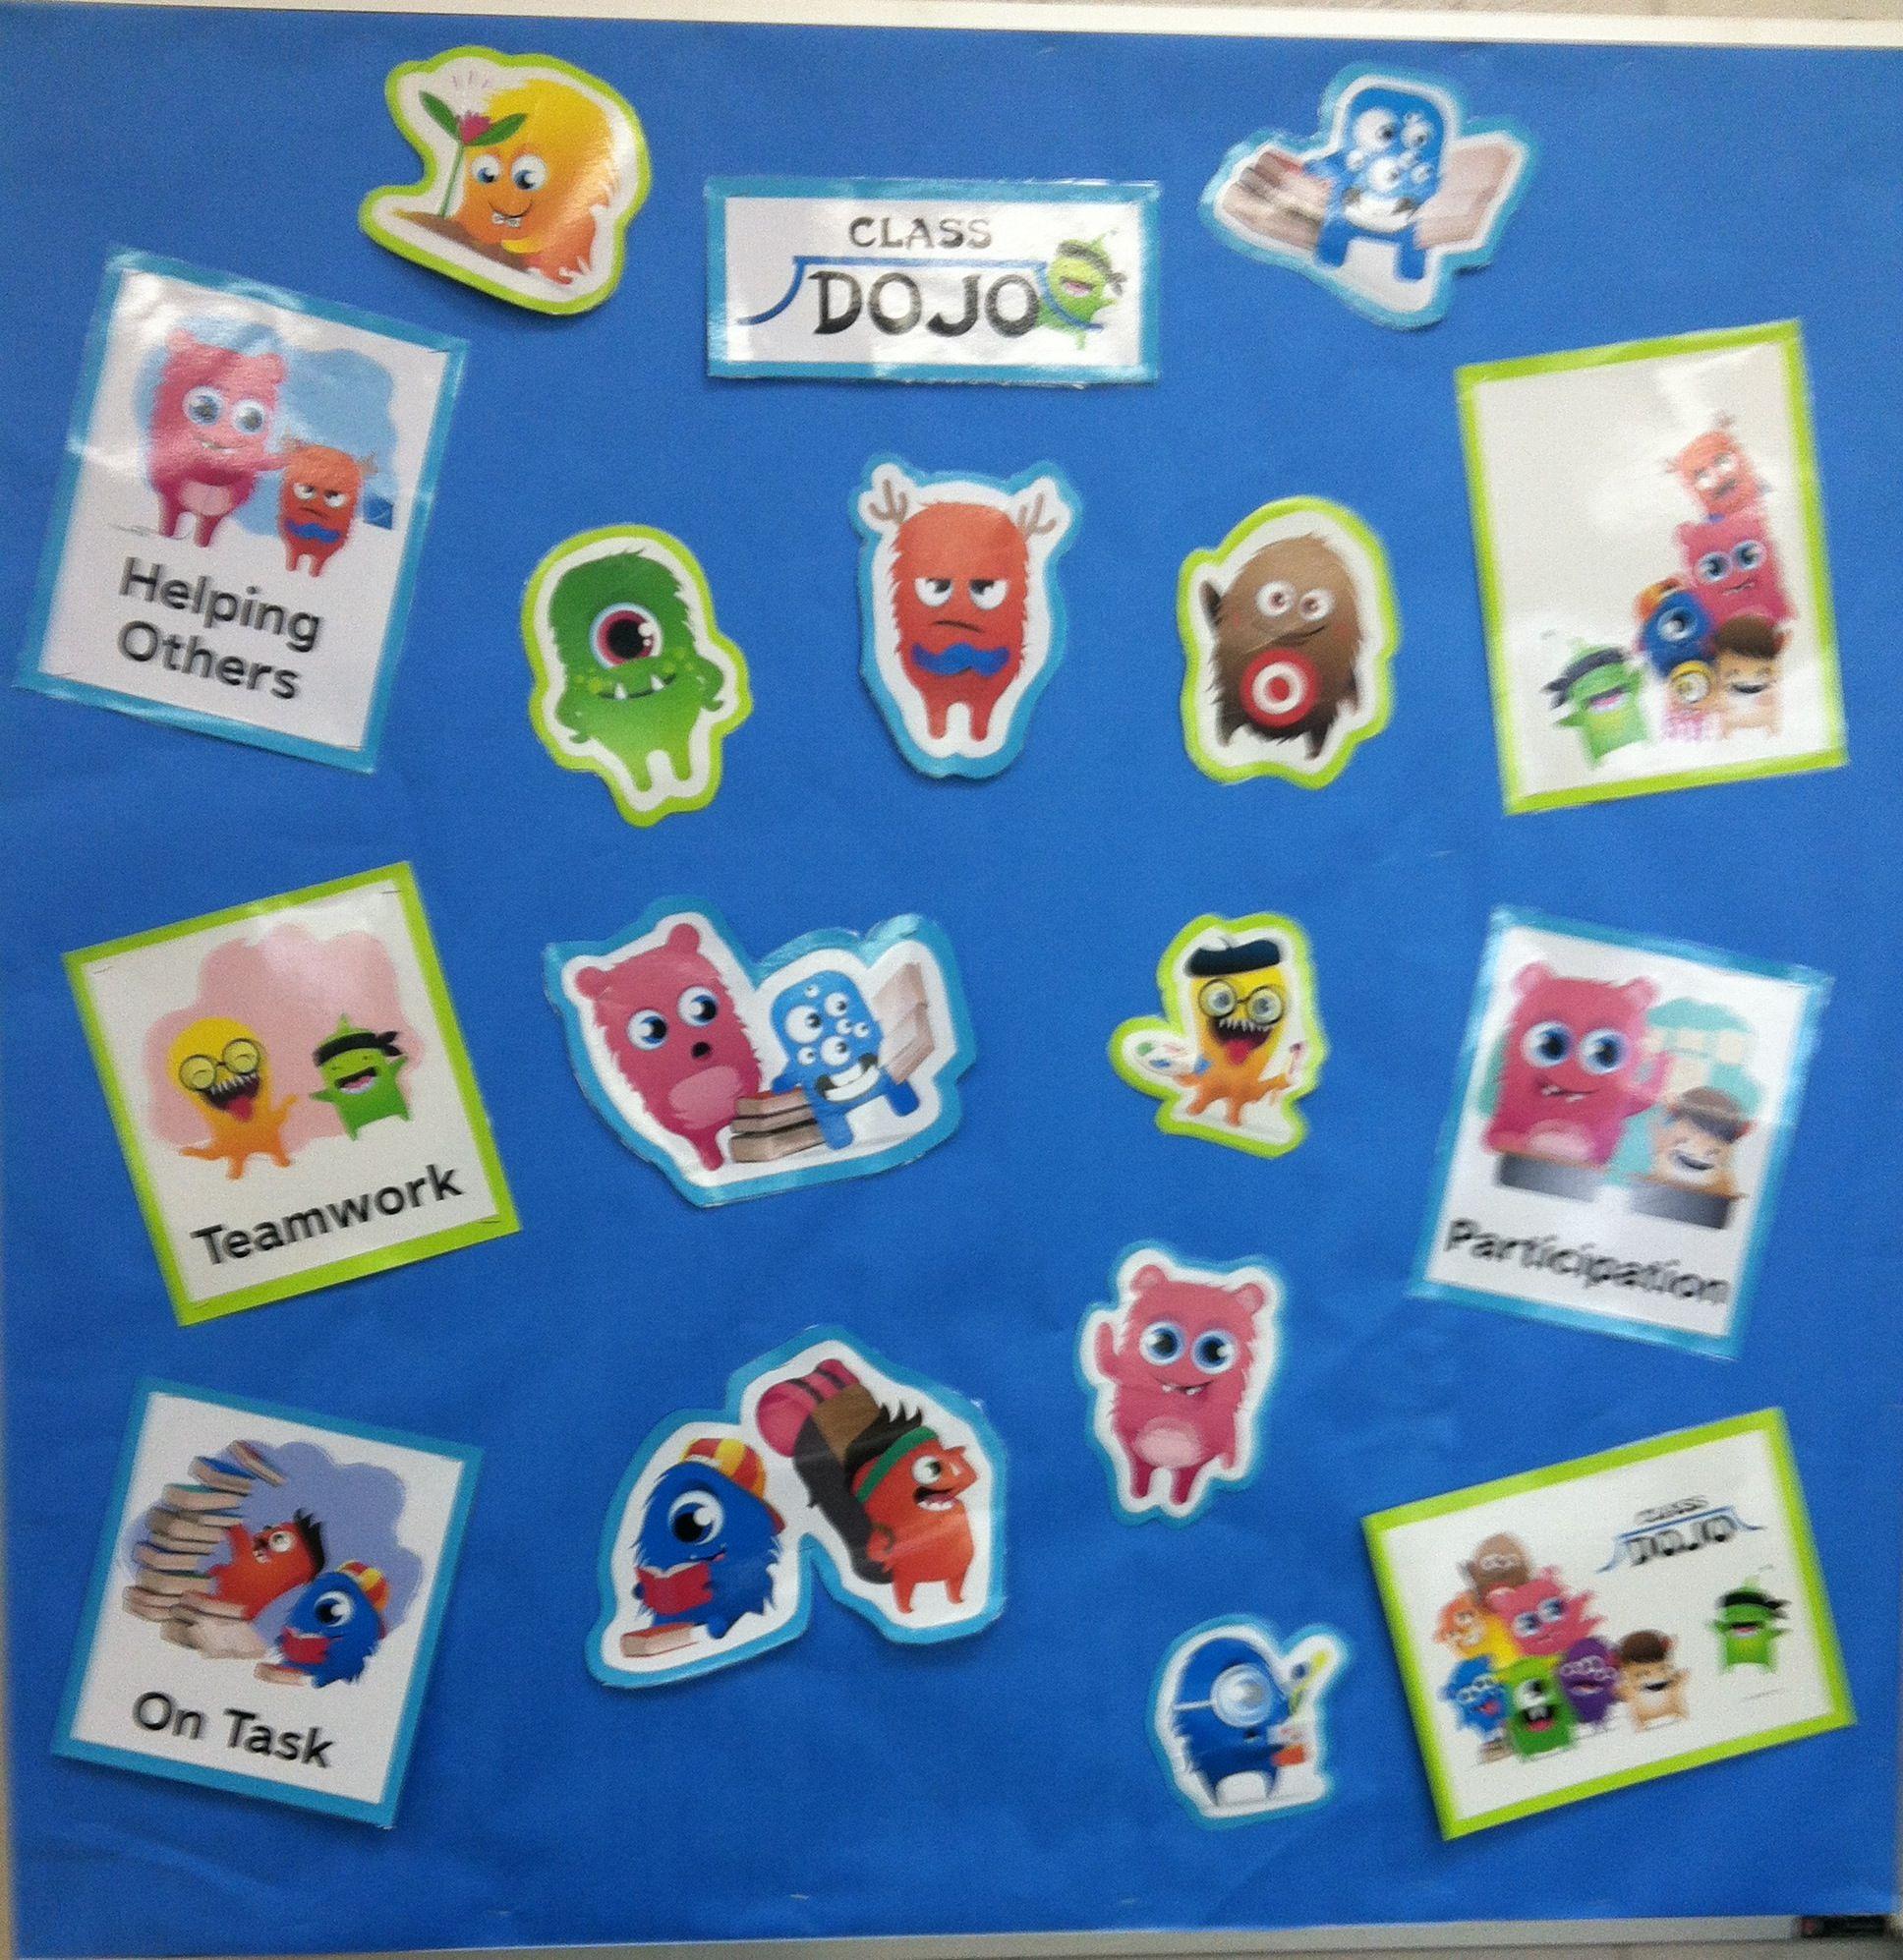 Classdojo Classdojolove Bulletin Board For Classroom